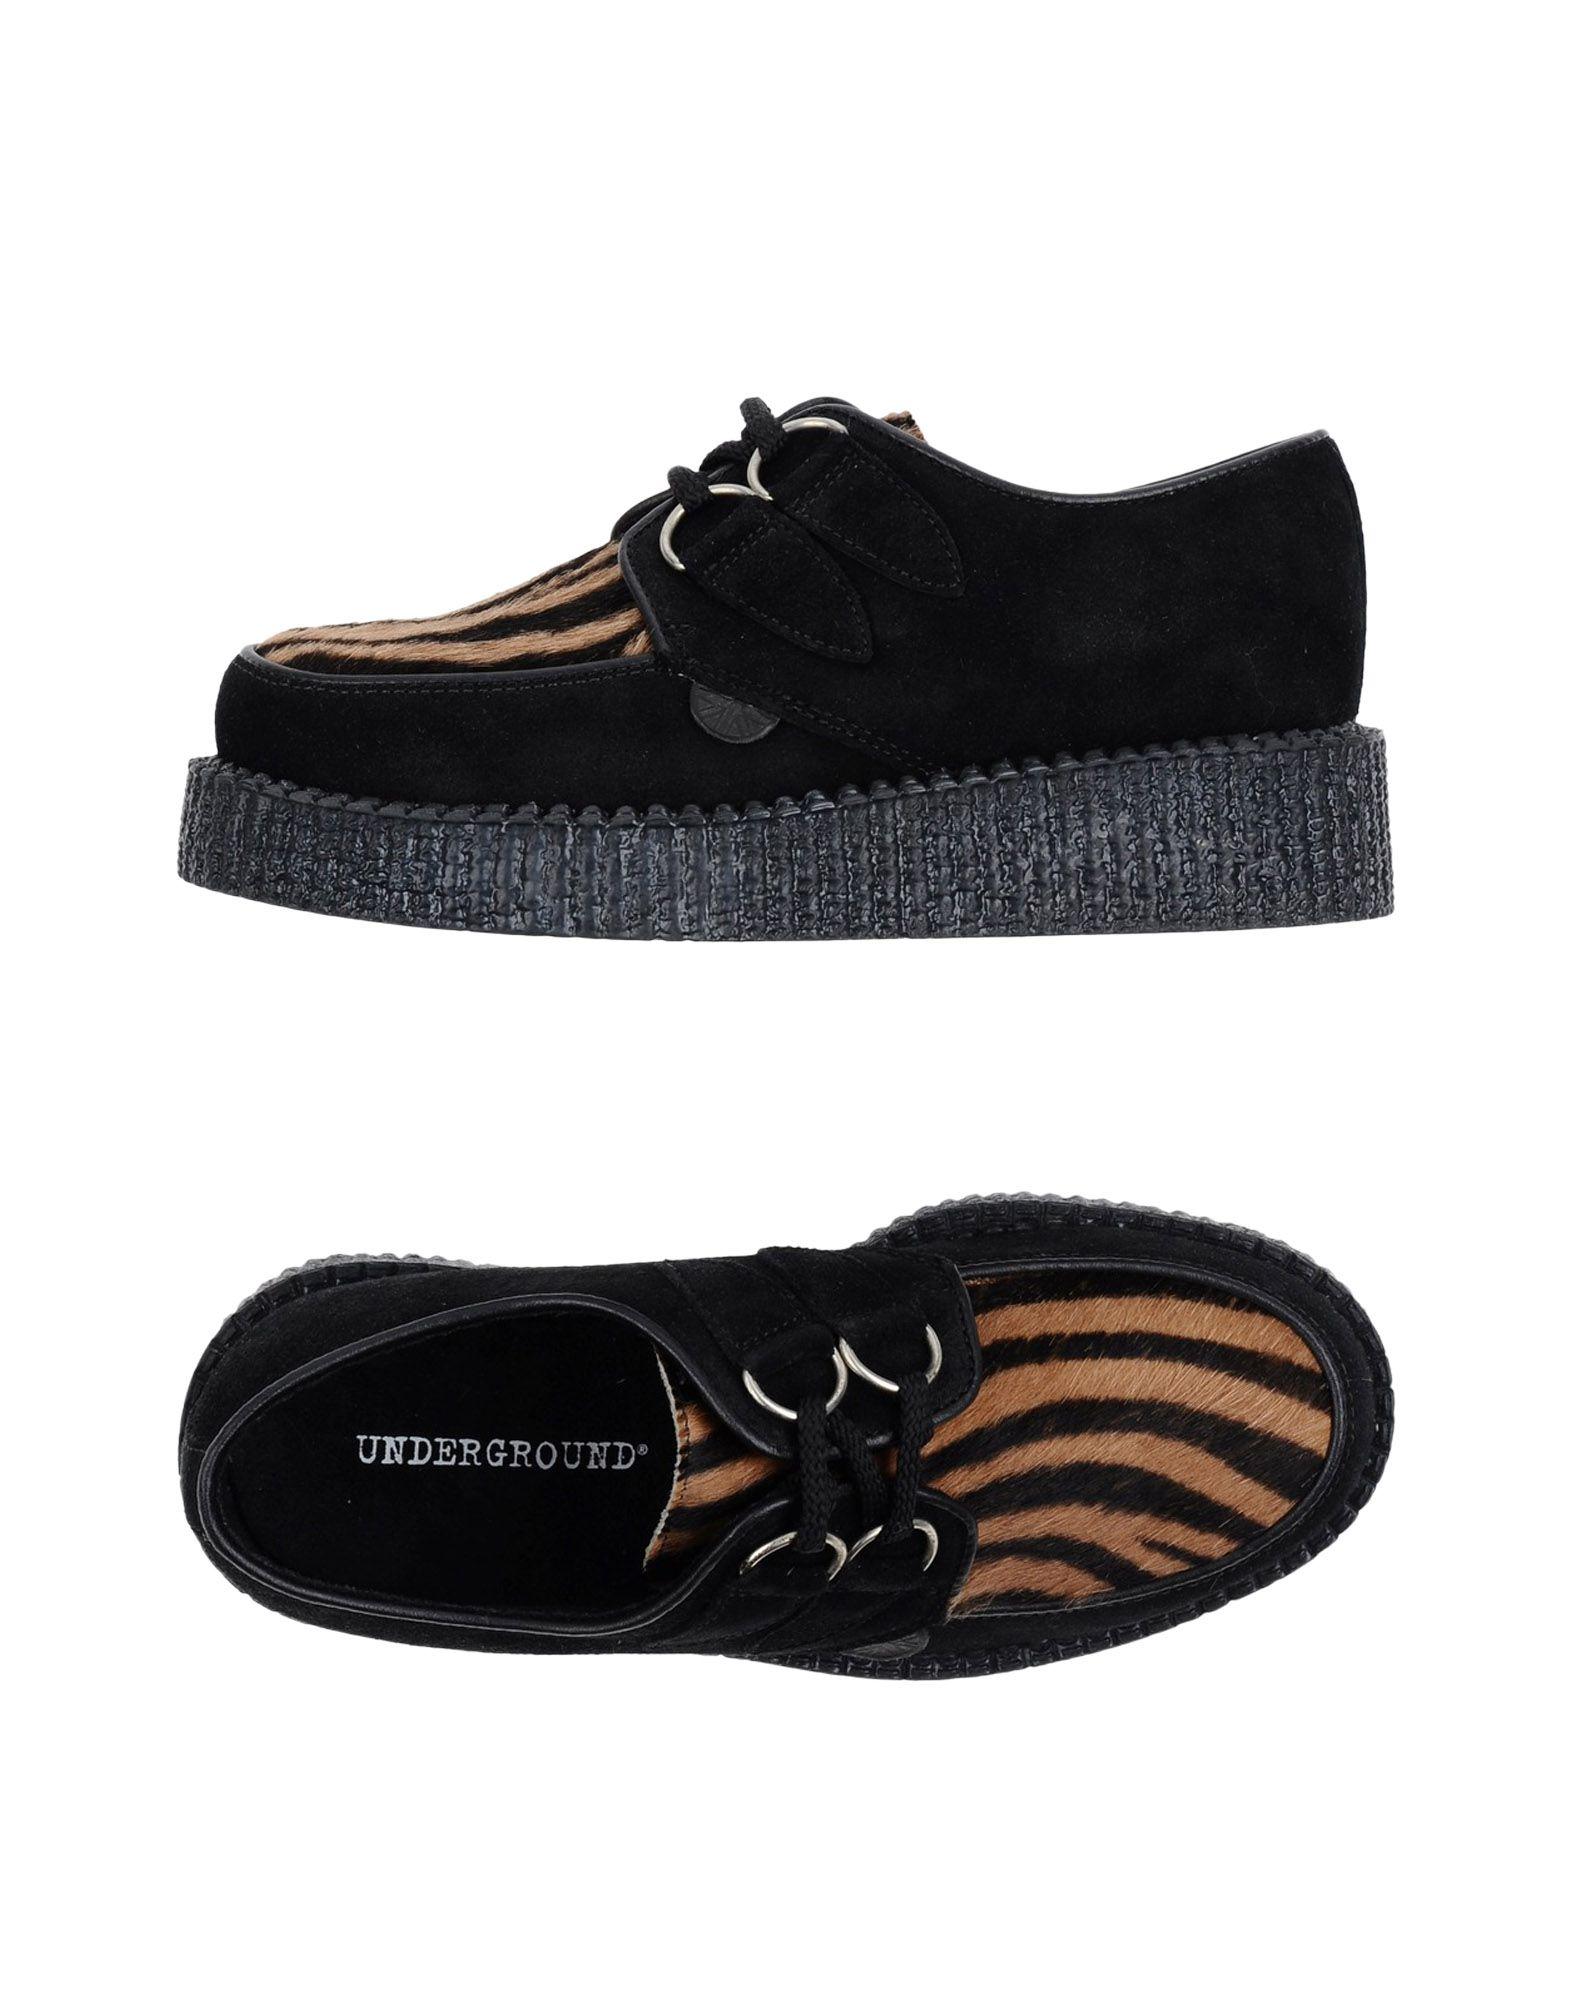 Chaussures À Lacets Underground Femme - Chaussures À Lacets Underground sur